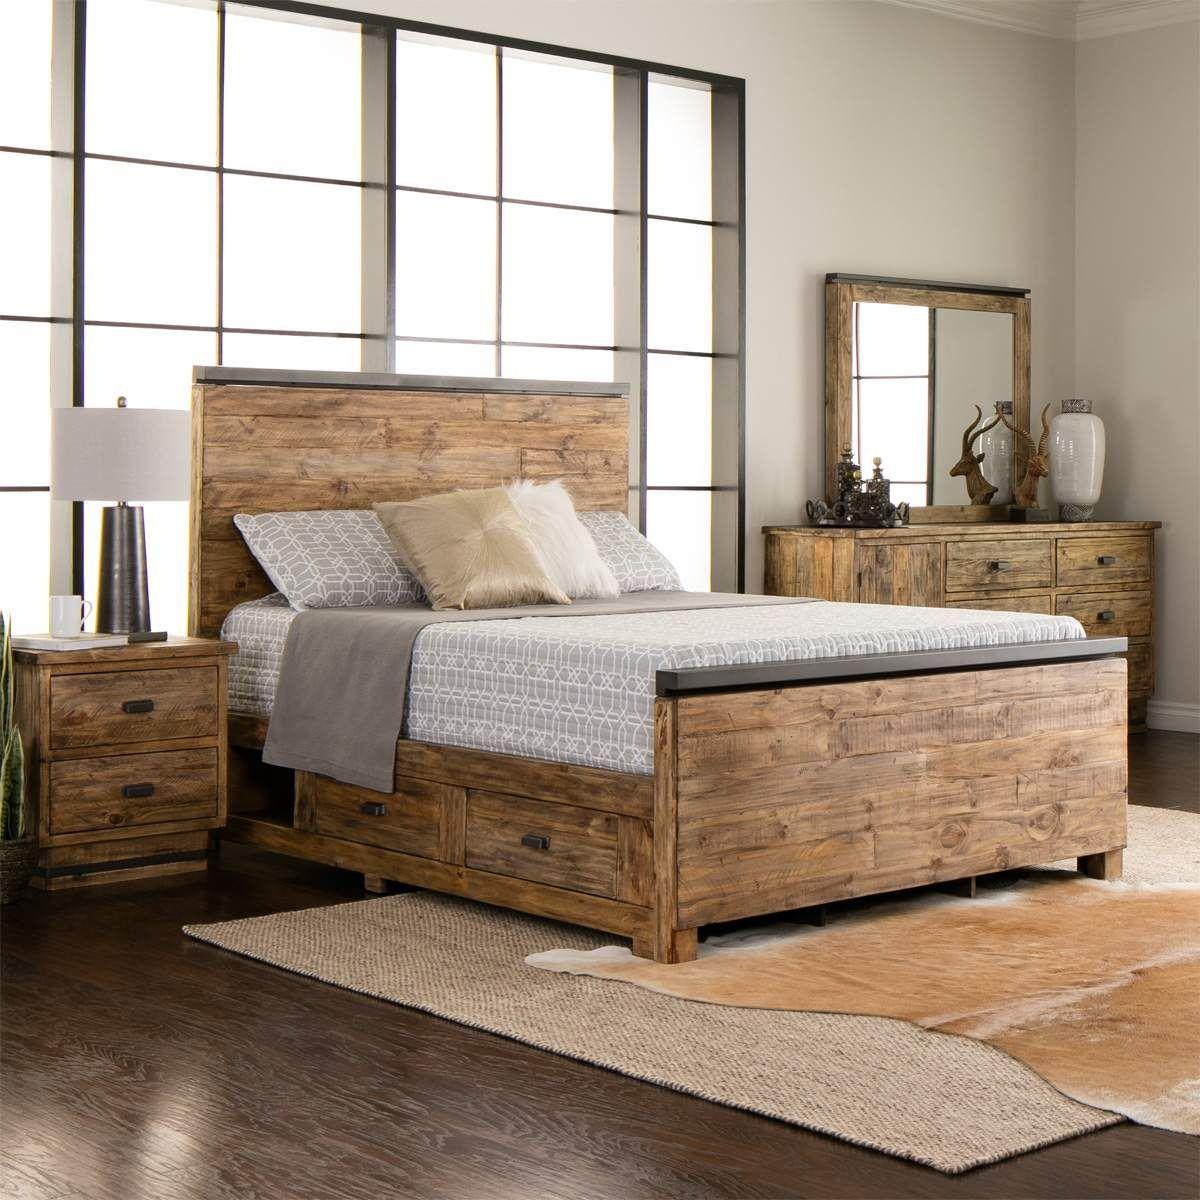 rustic bedroom furniture sets rustic